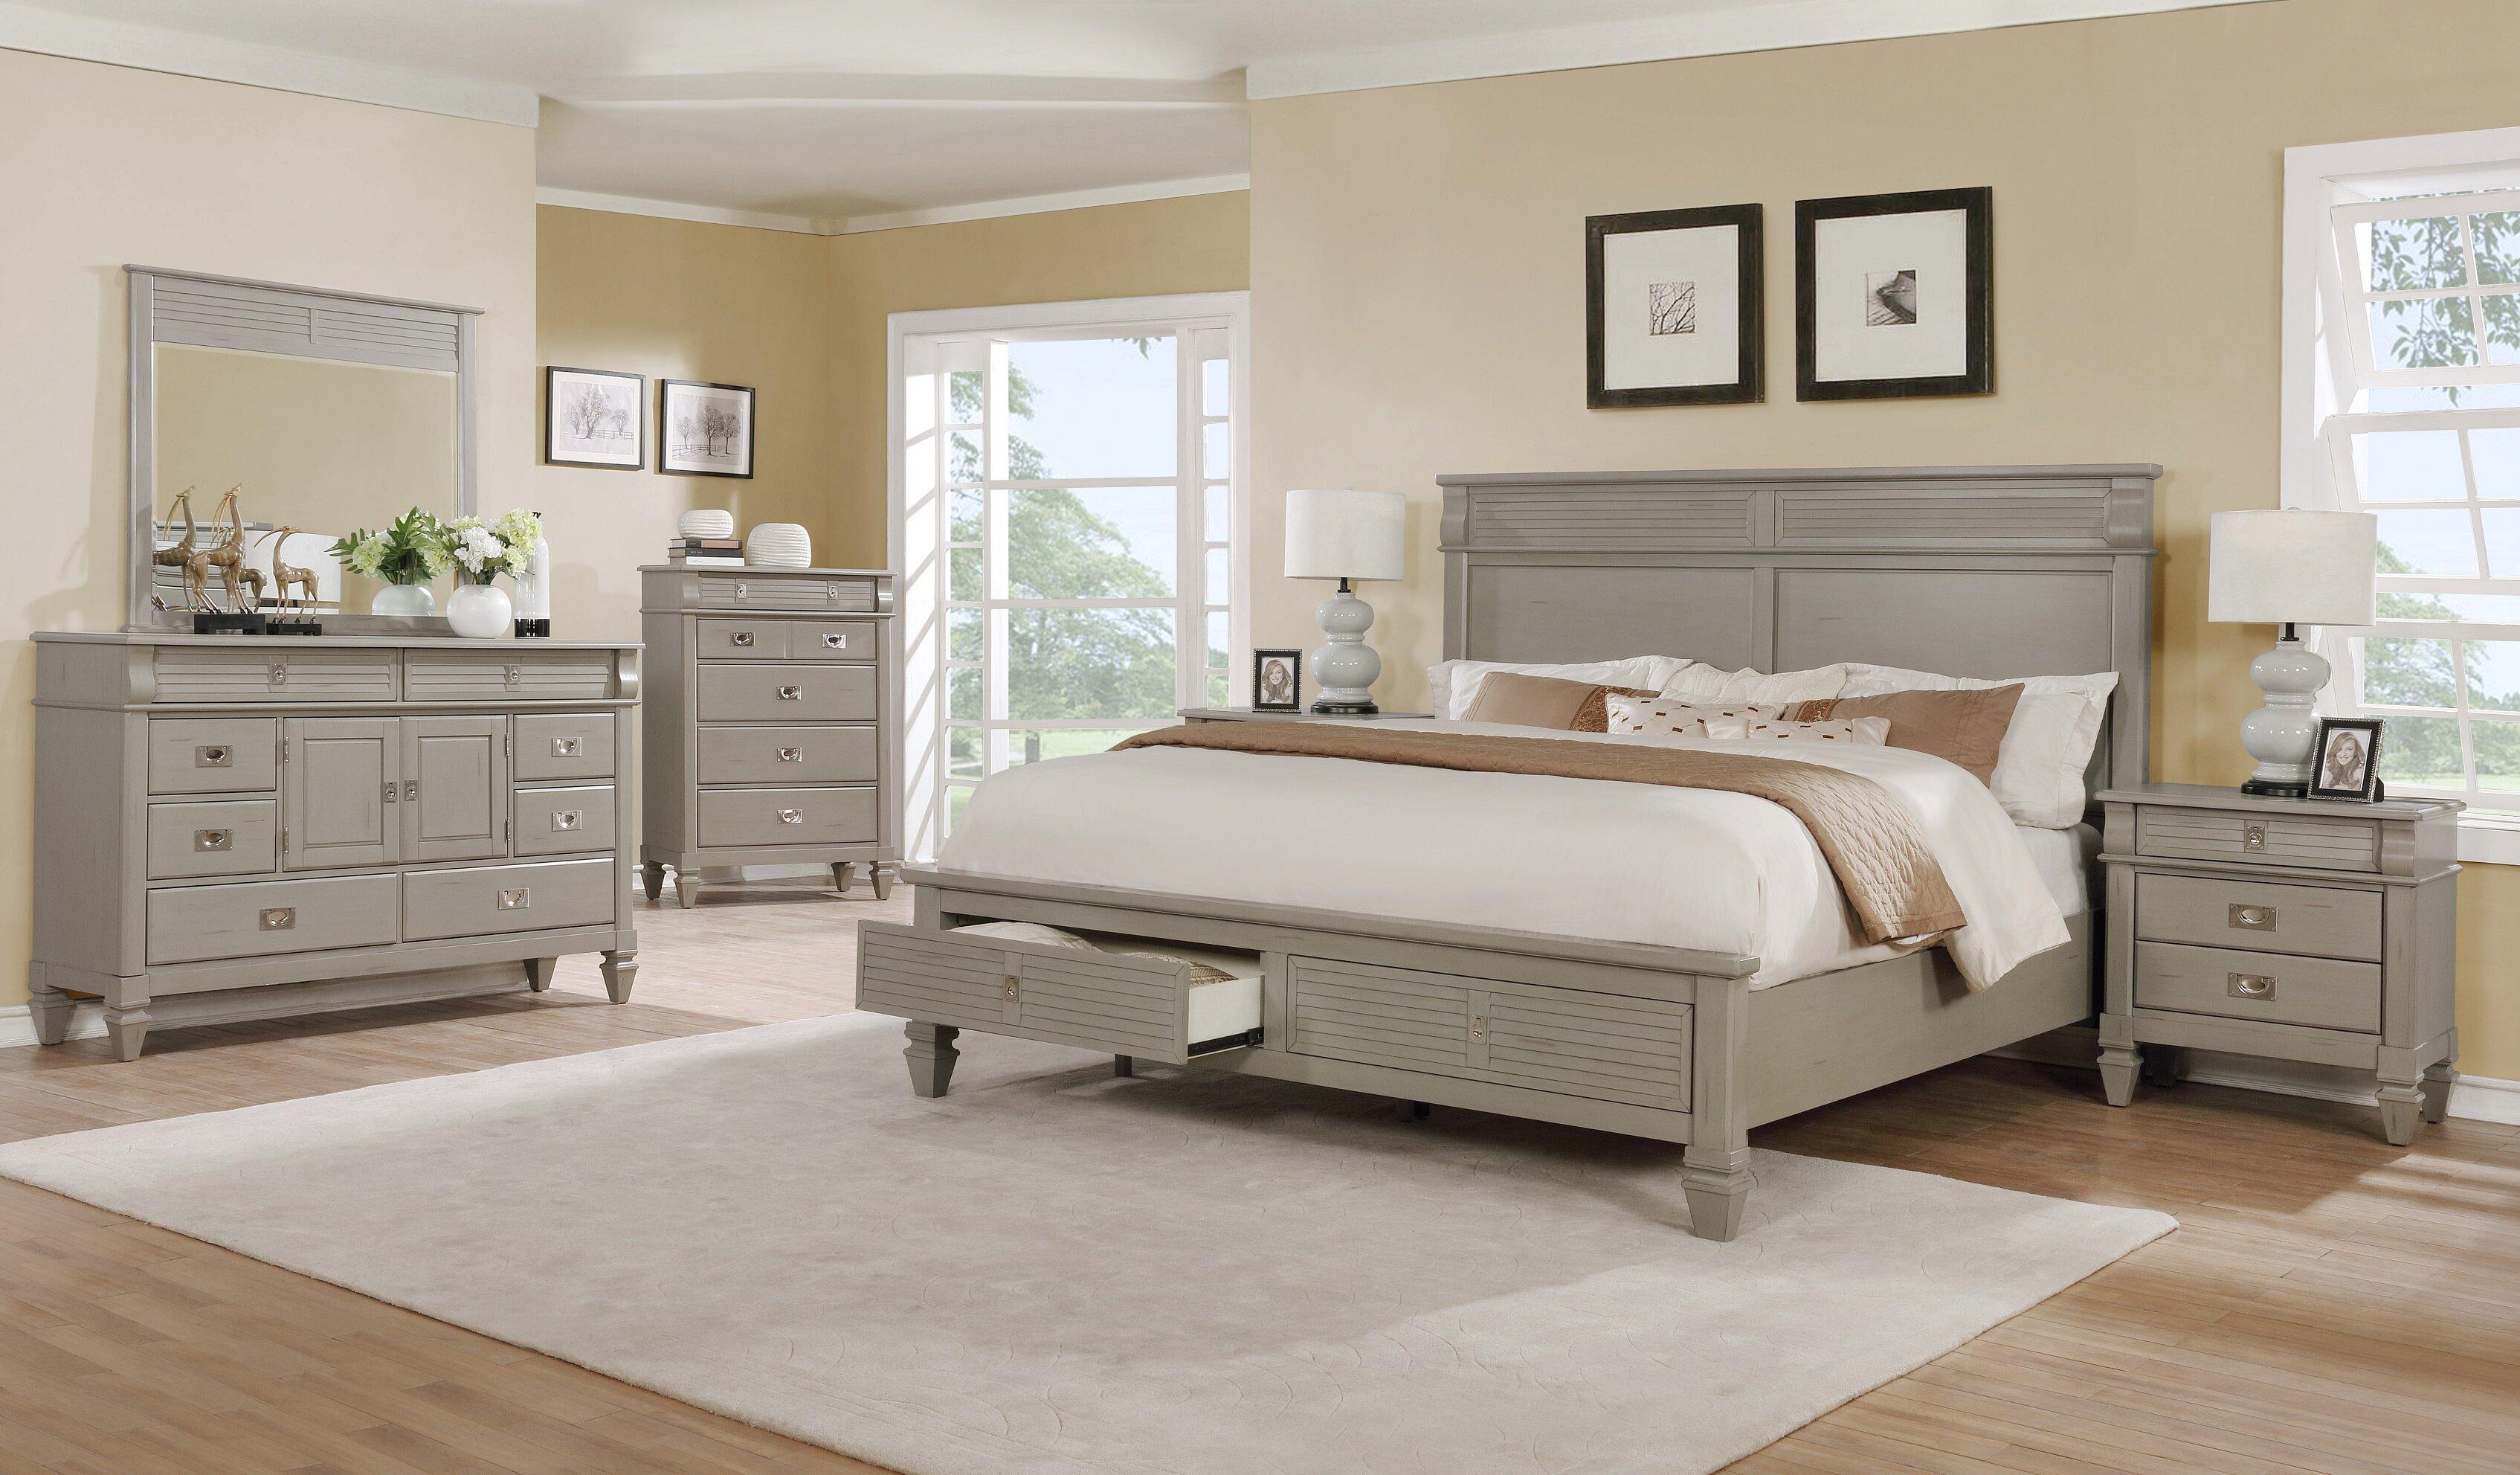 Beachcrest Home Vasilikos Platform Solid Wood 4 Piece Bedroom Set